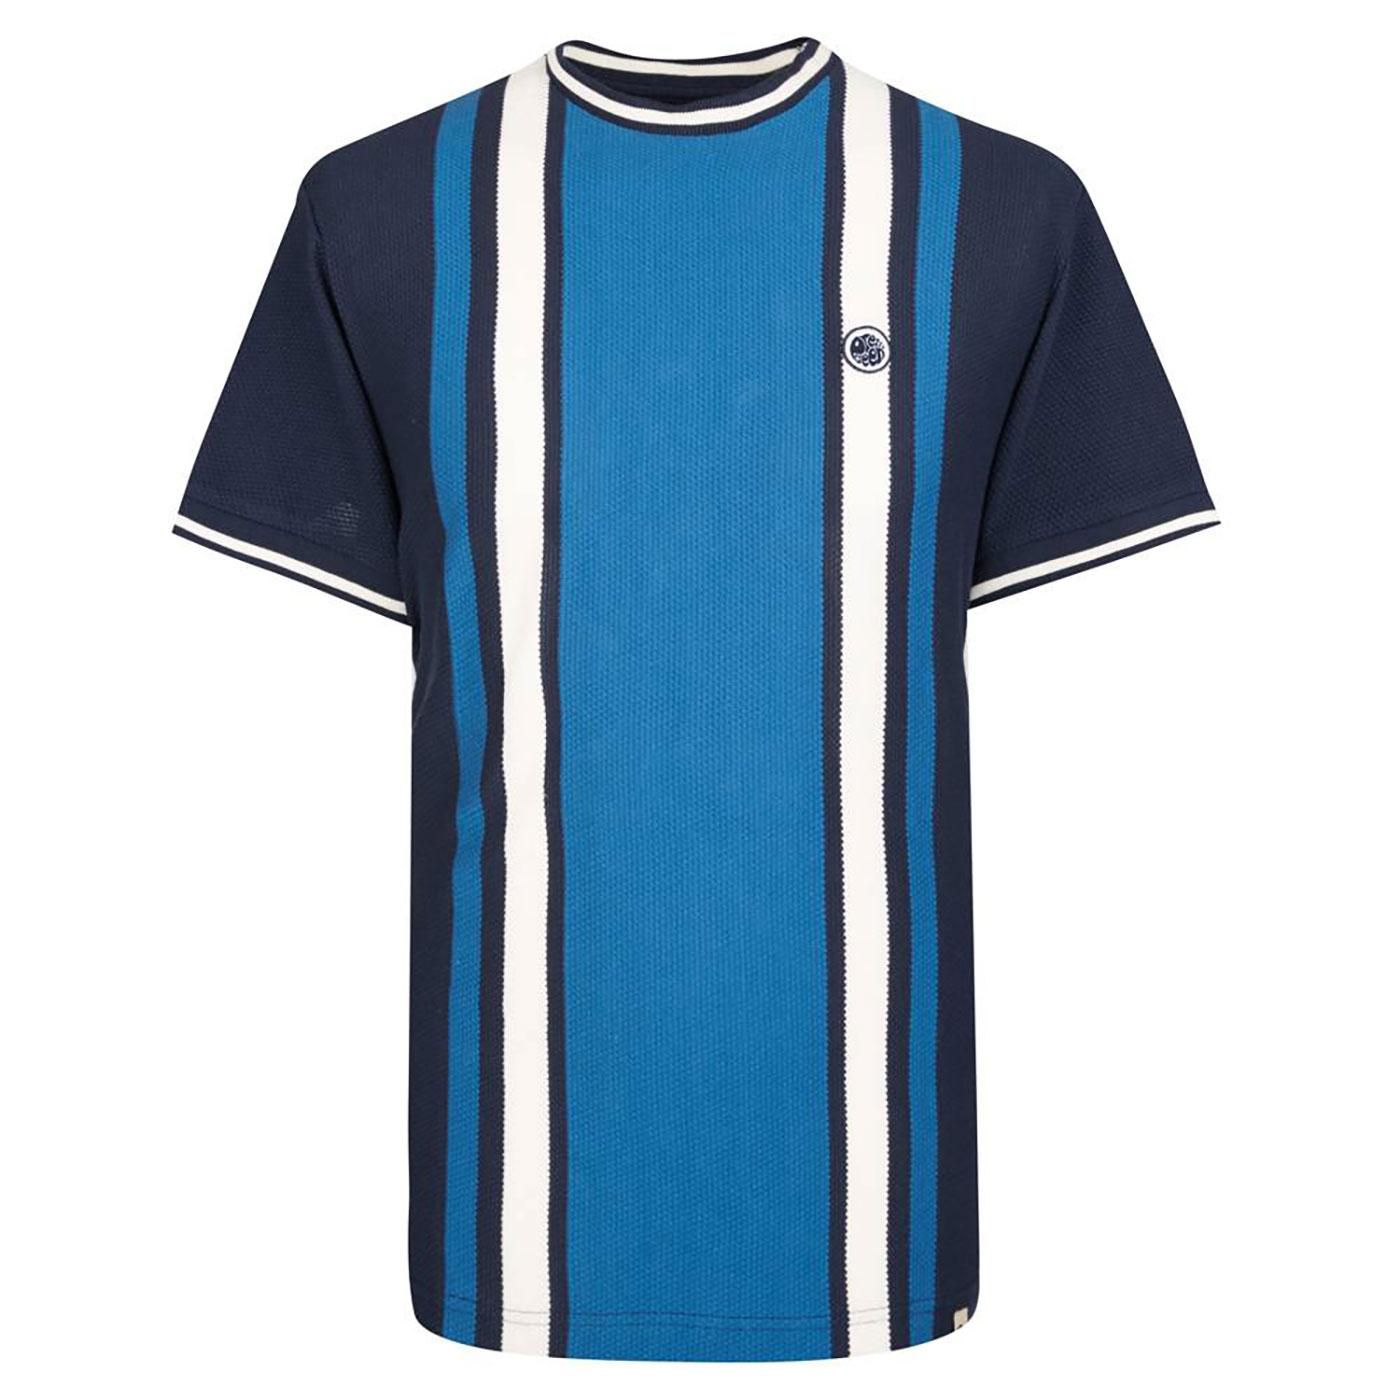 PRETTY GREEN Men's Mod Textured Stripe T-Shirt N